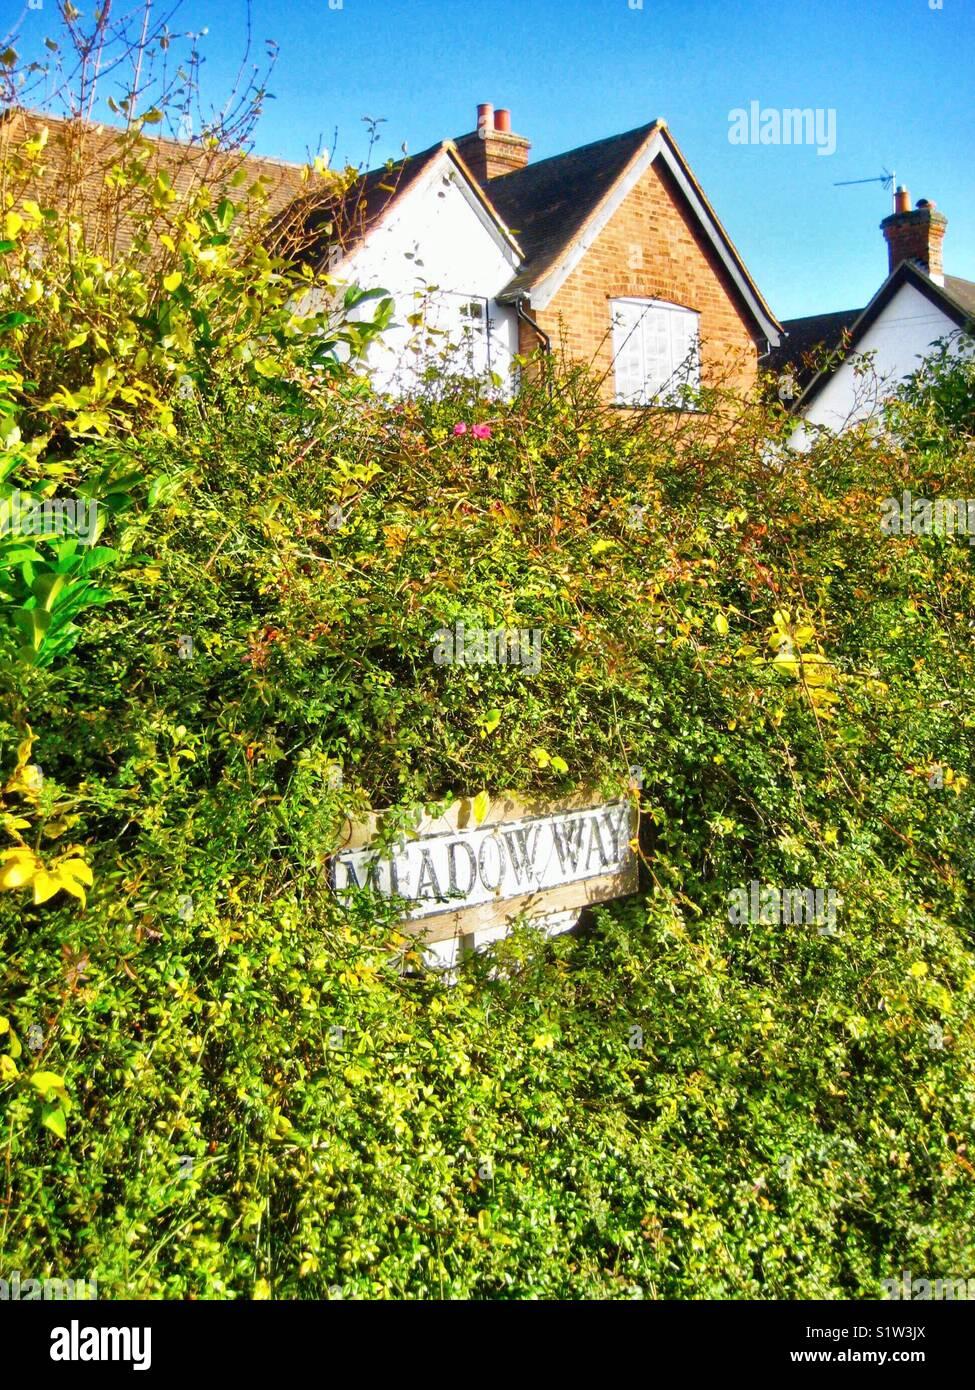 Meadow Way - Stock Image